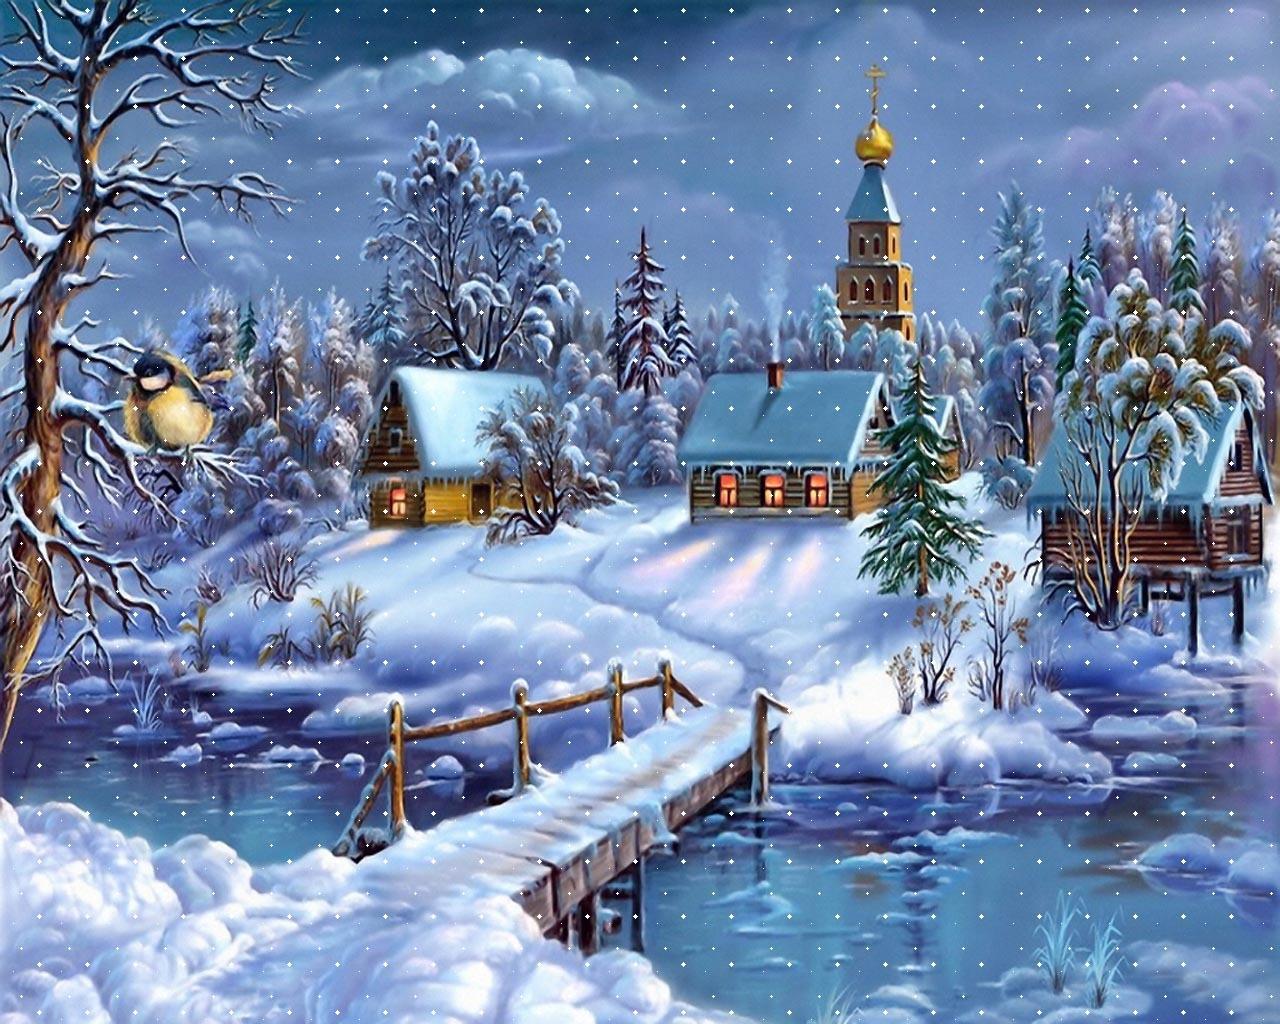 desktop wallpapersblogspotcom201209free animated winter desktop 1280x1024